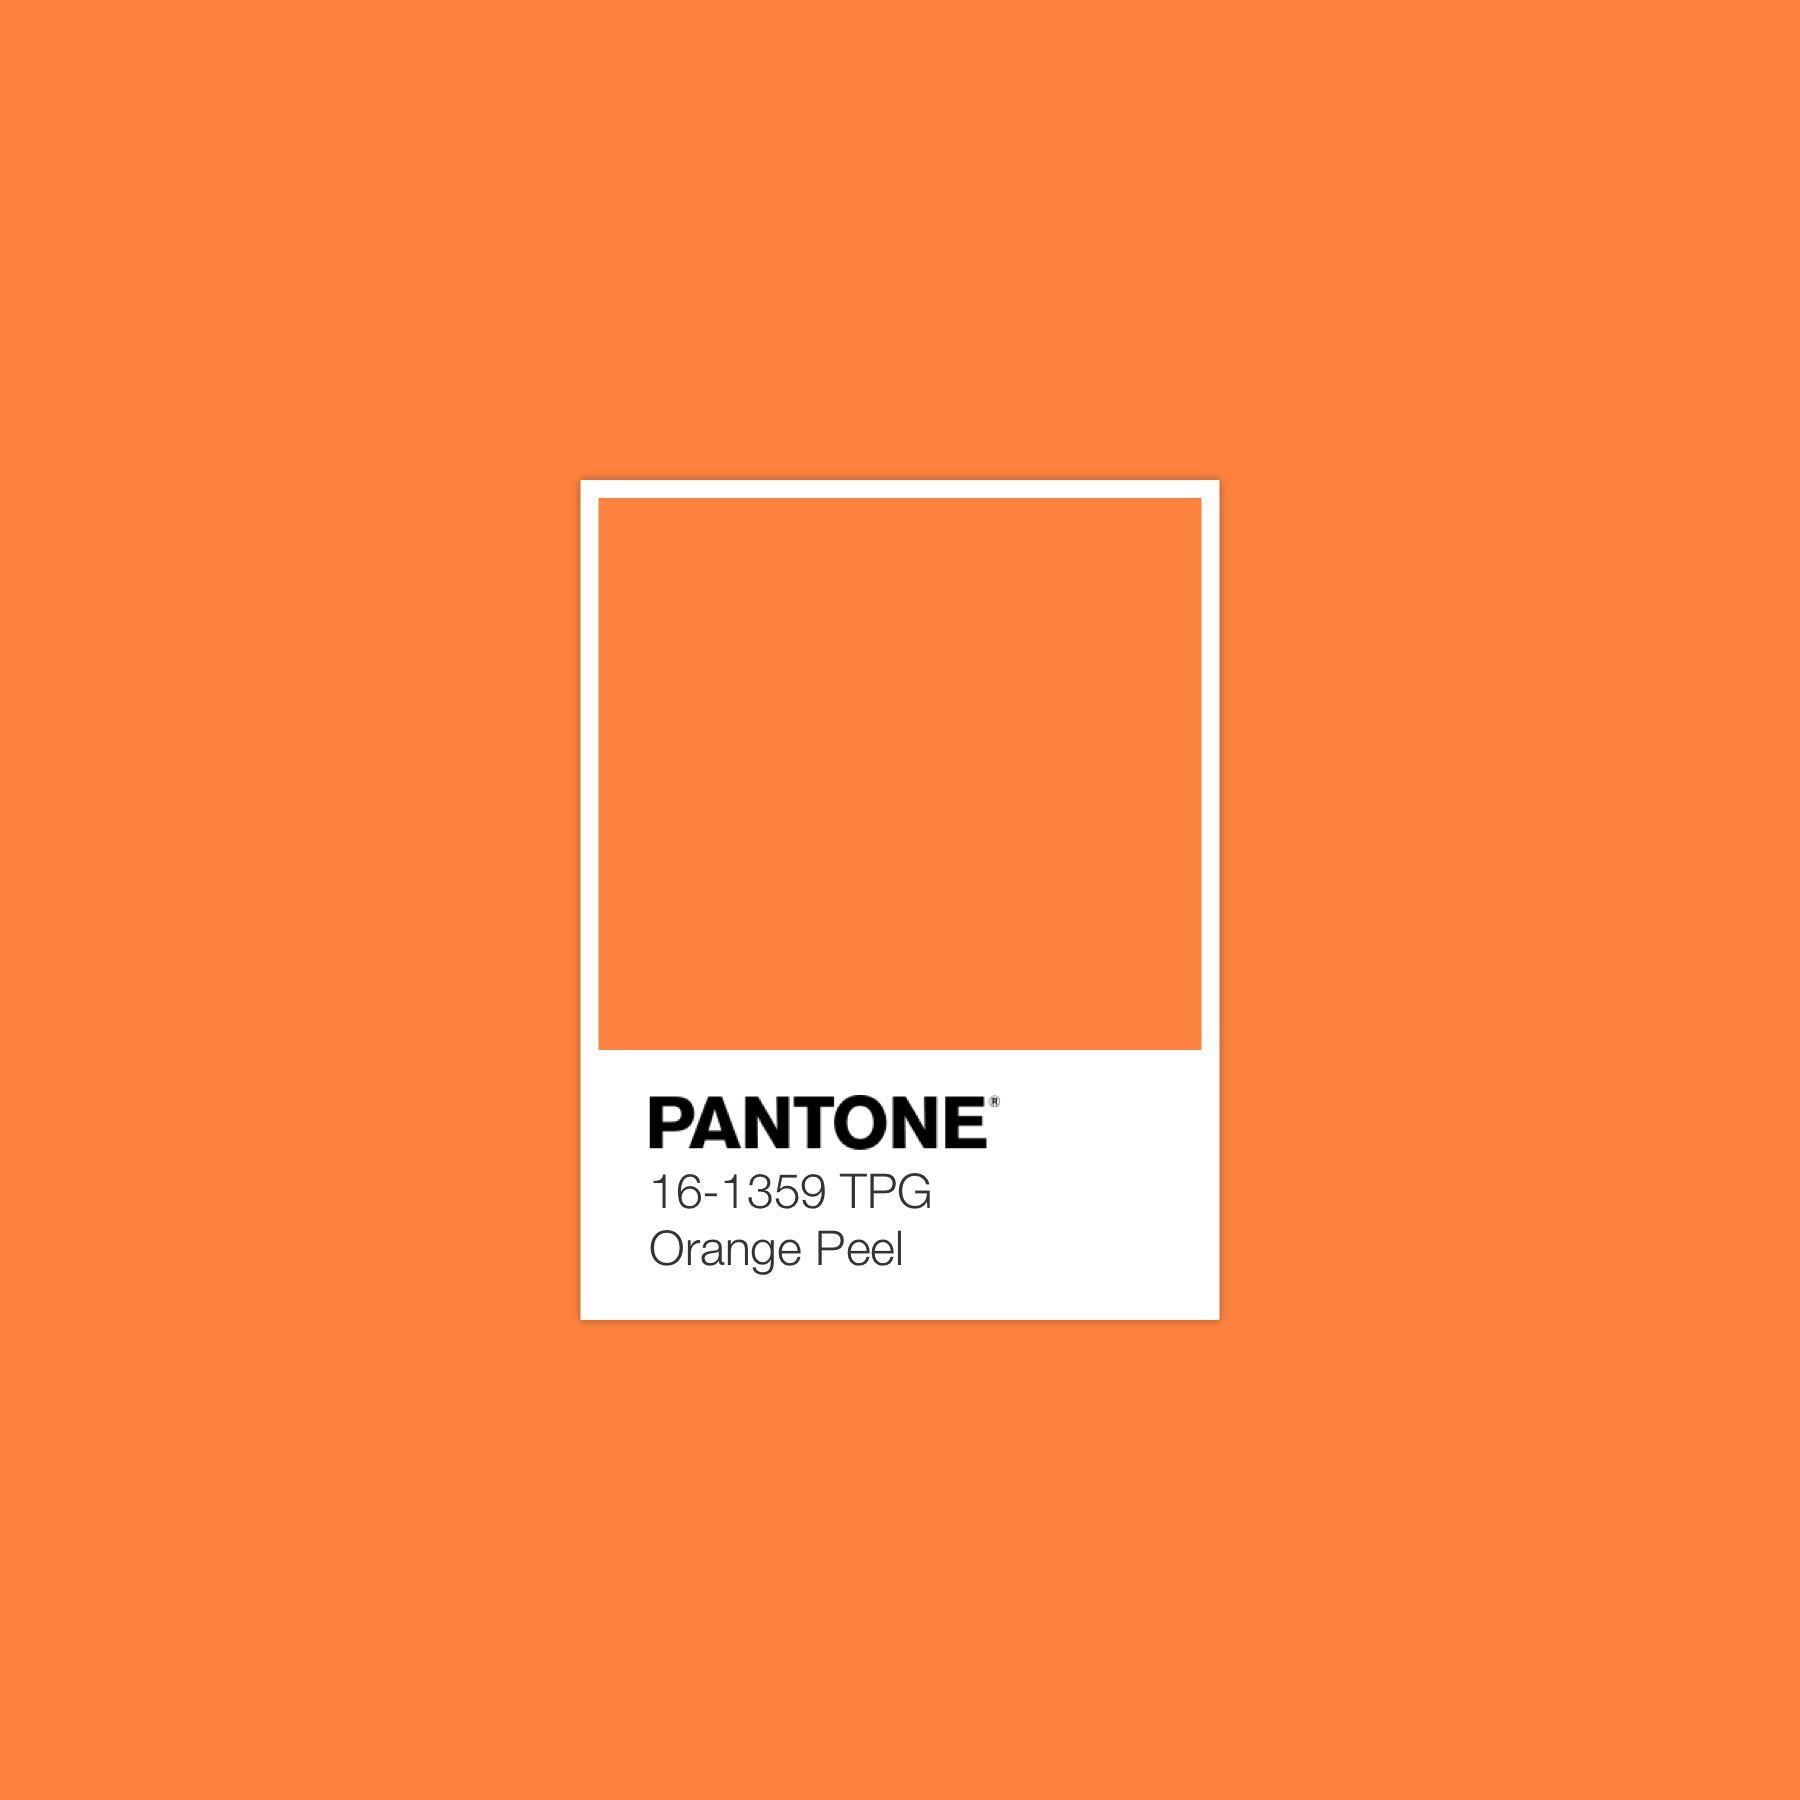 Orangepeel Luxurydotcom Pantone Pantone Color Chart Pantone Orange Pantone Color